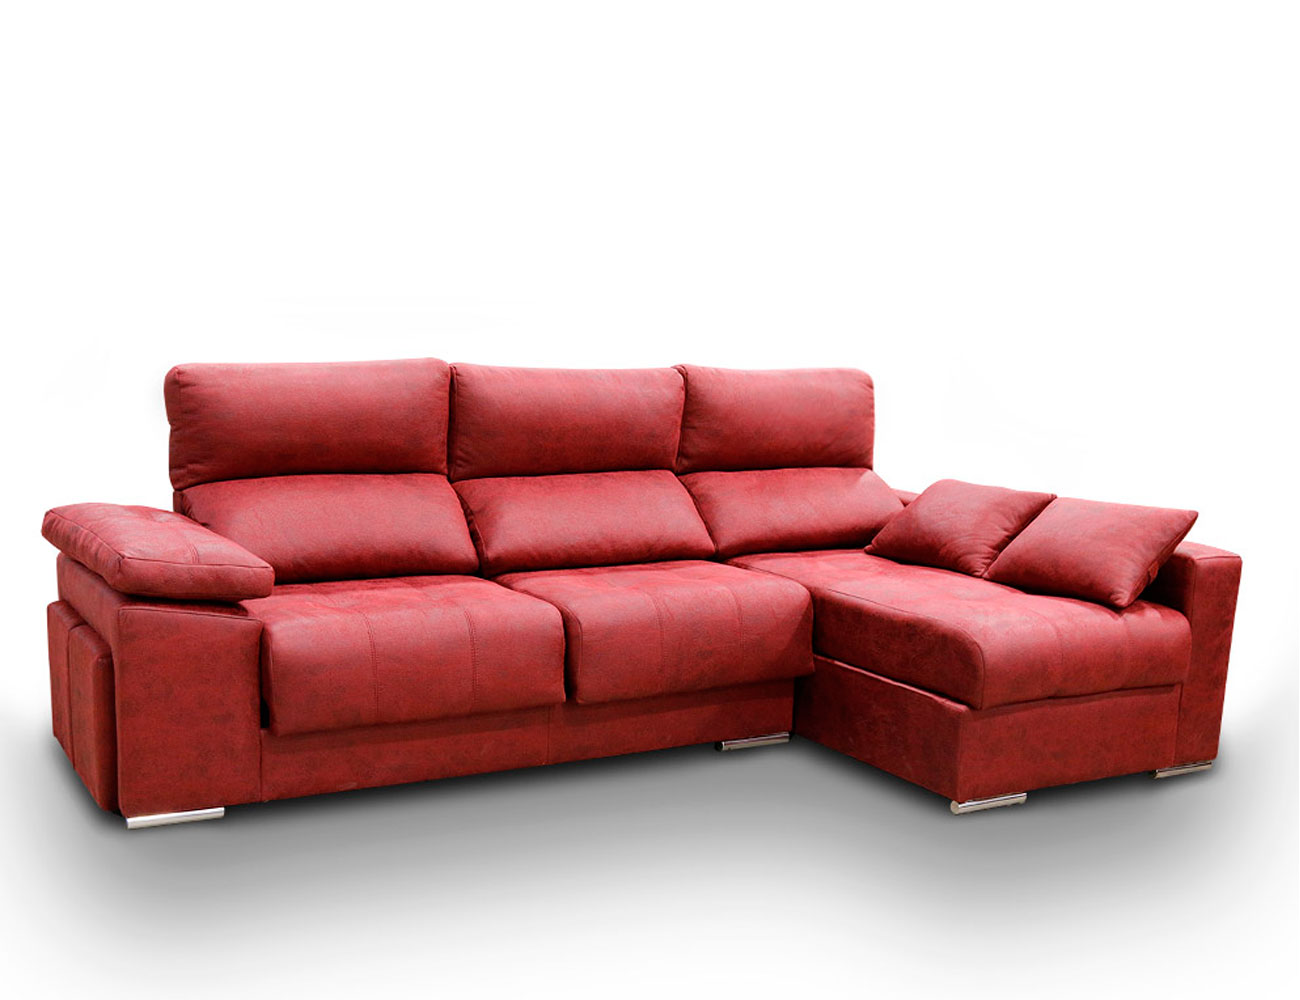 Sofa chaiselongue anti manchas rojo granate